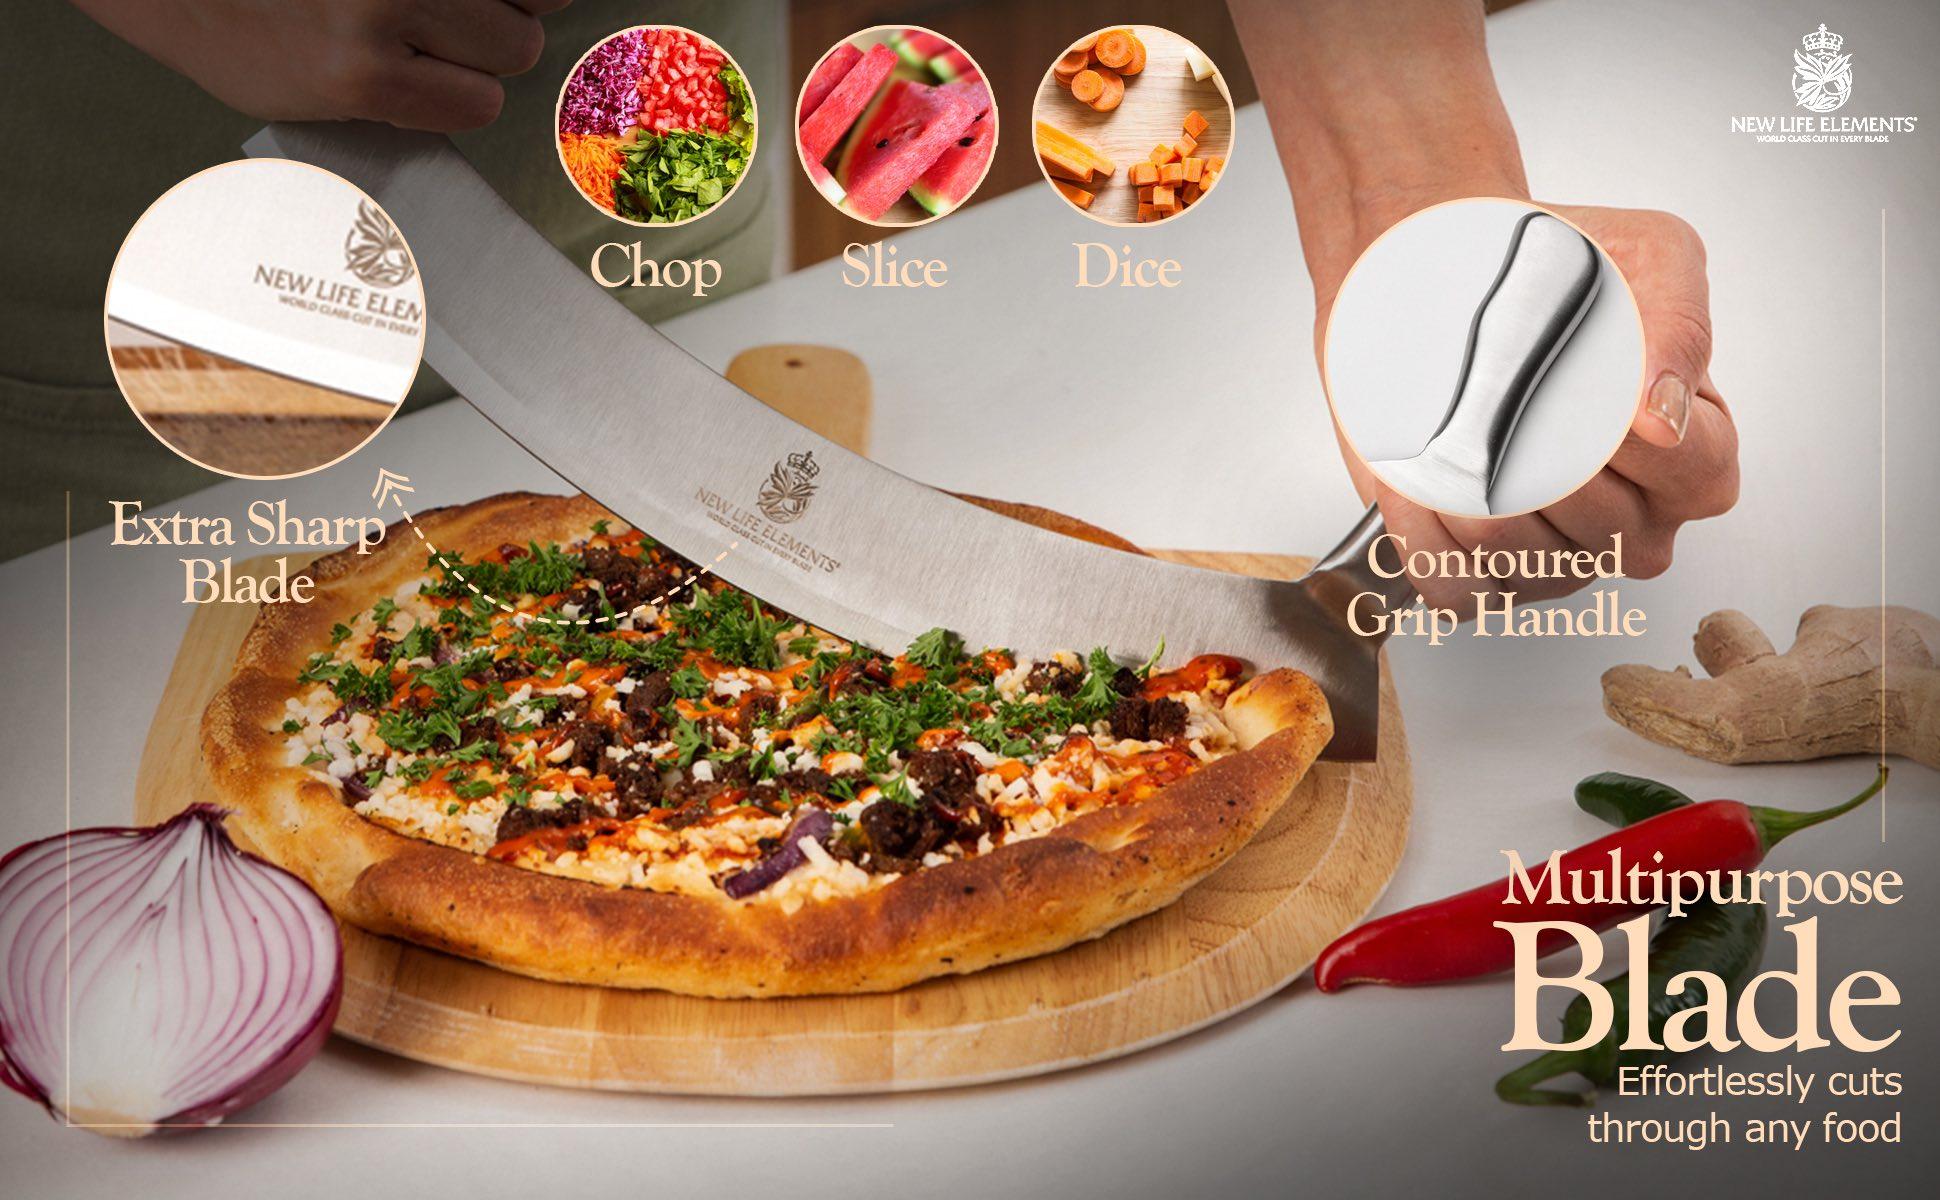 electric conveyor pizza oven outdoor kitchen with pizza oven wood oven pizza oven pizza 1oven pizza convection pizza oven Multi use kitchen knife sharp blade mezzaluna knife quality stainless steel